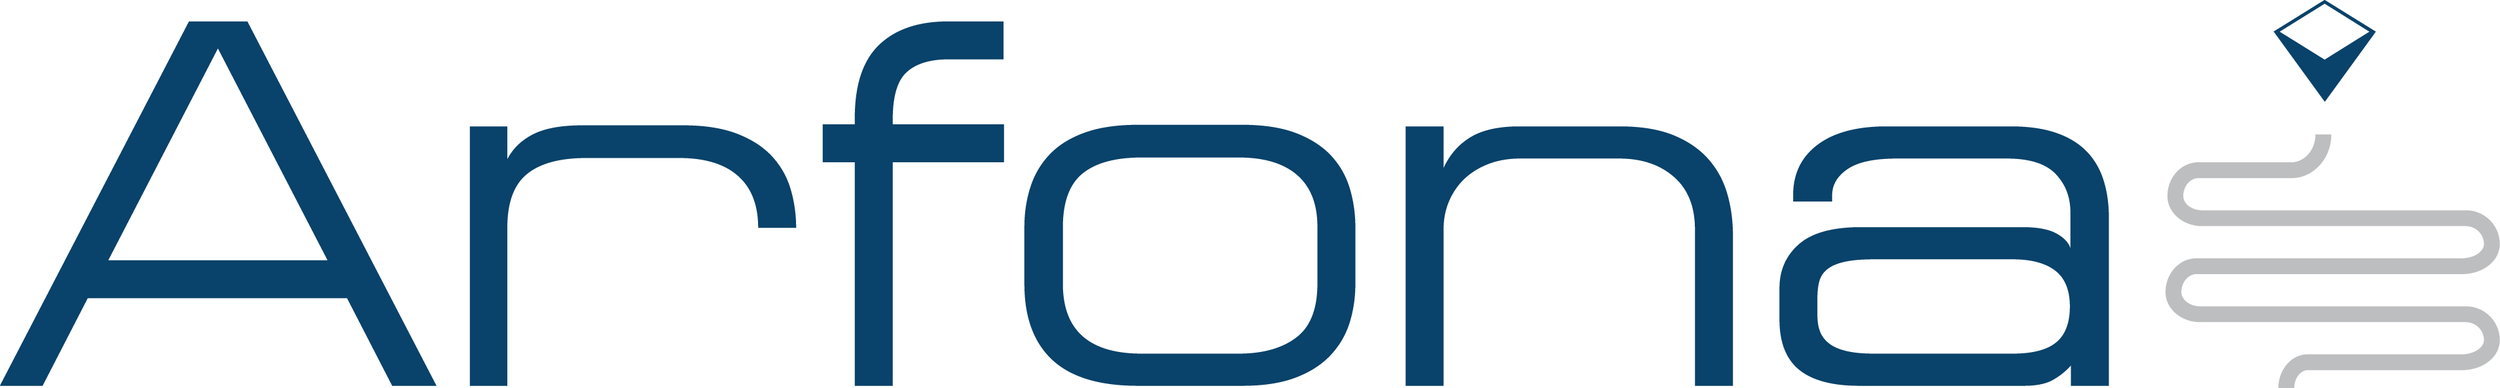 Arfona Logo Only.png